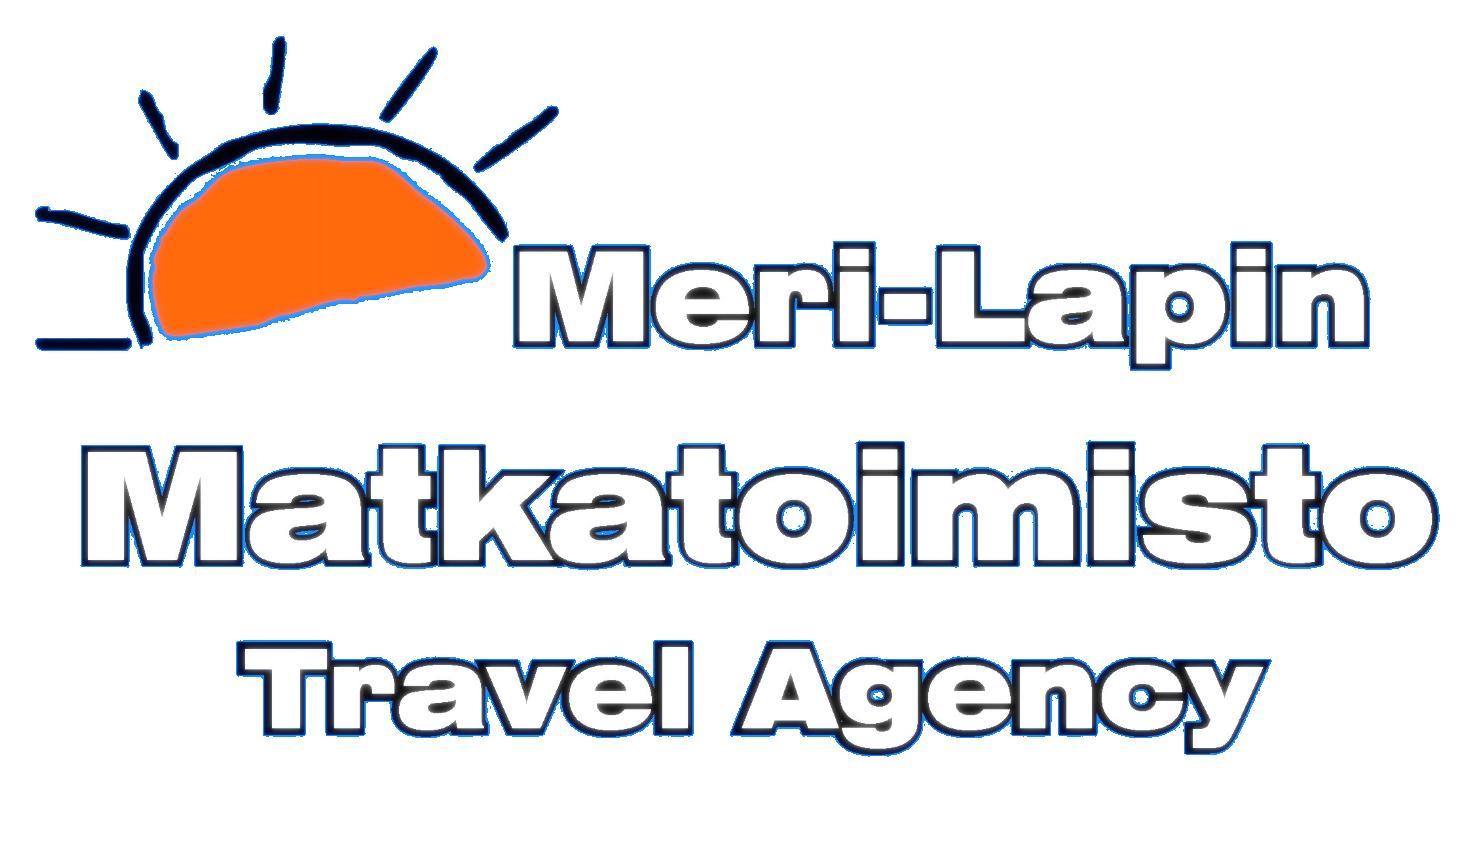 Sealapland-Travel-Agency